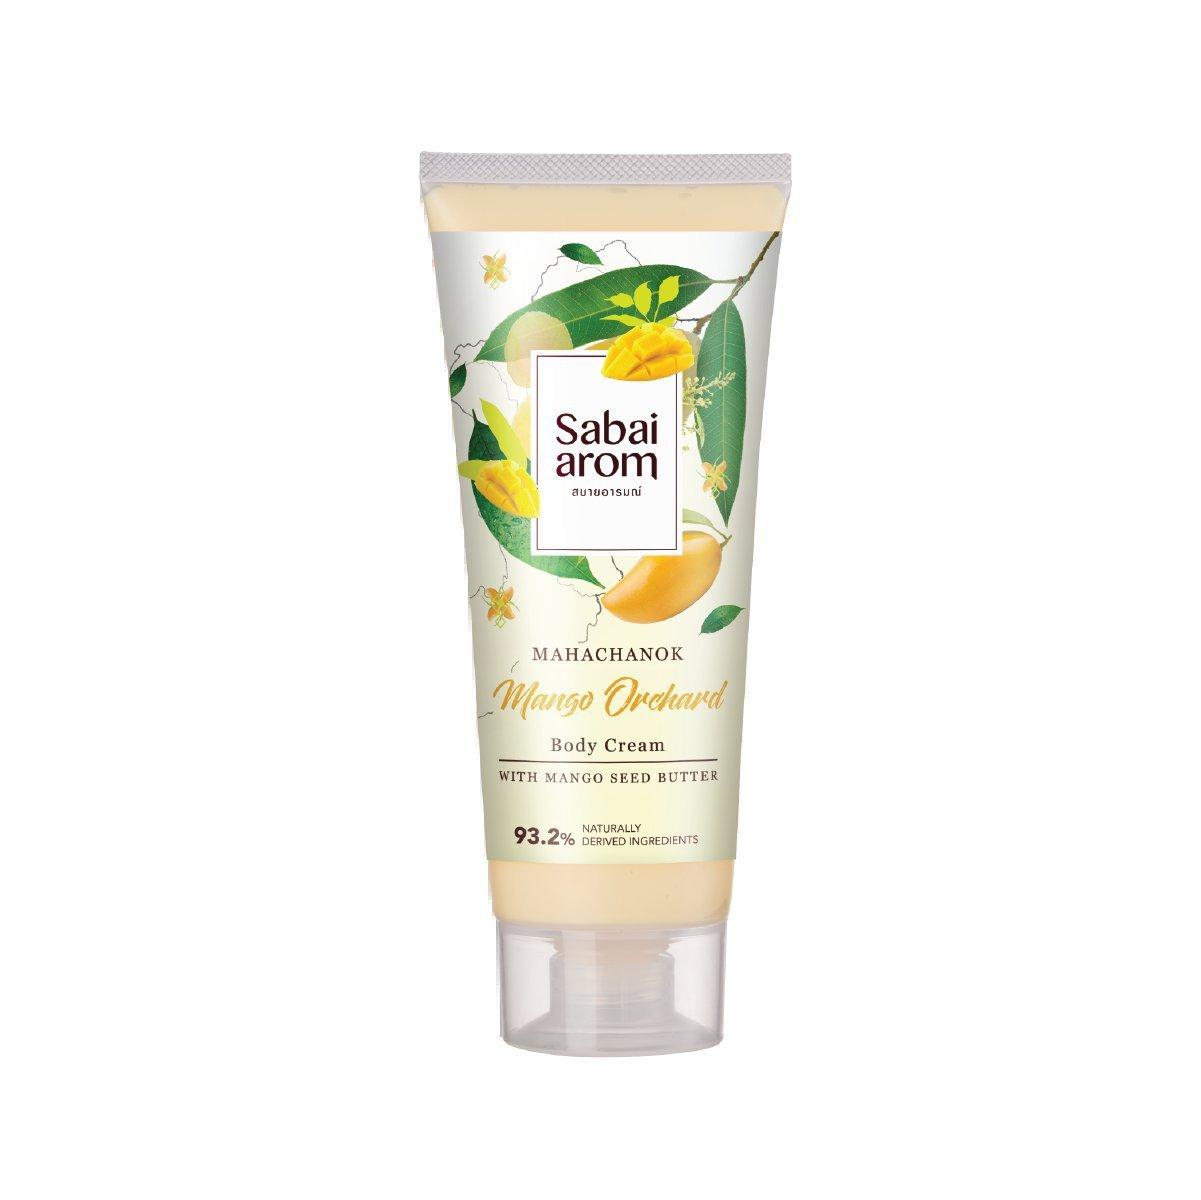 Sabai-arom Mango Orchard Body Cream 200 g. (4 Pack)